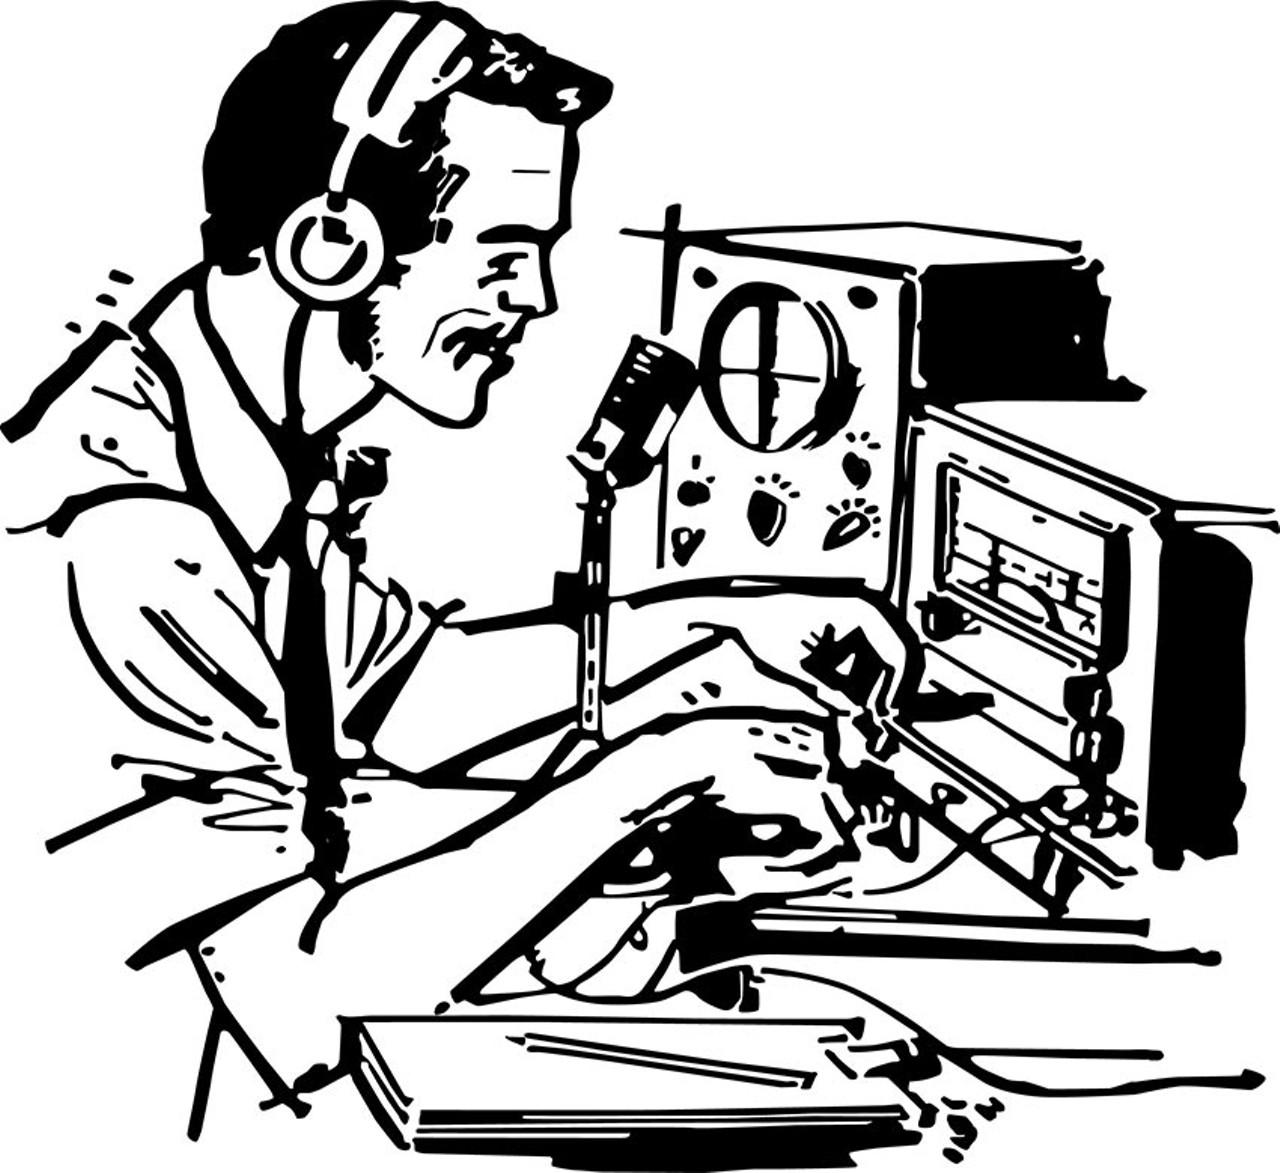 ham-radio-guy.jpg